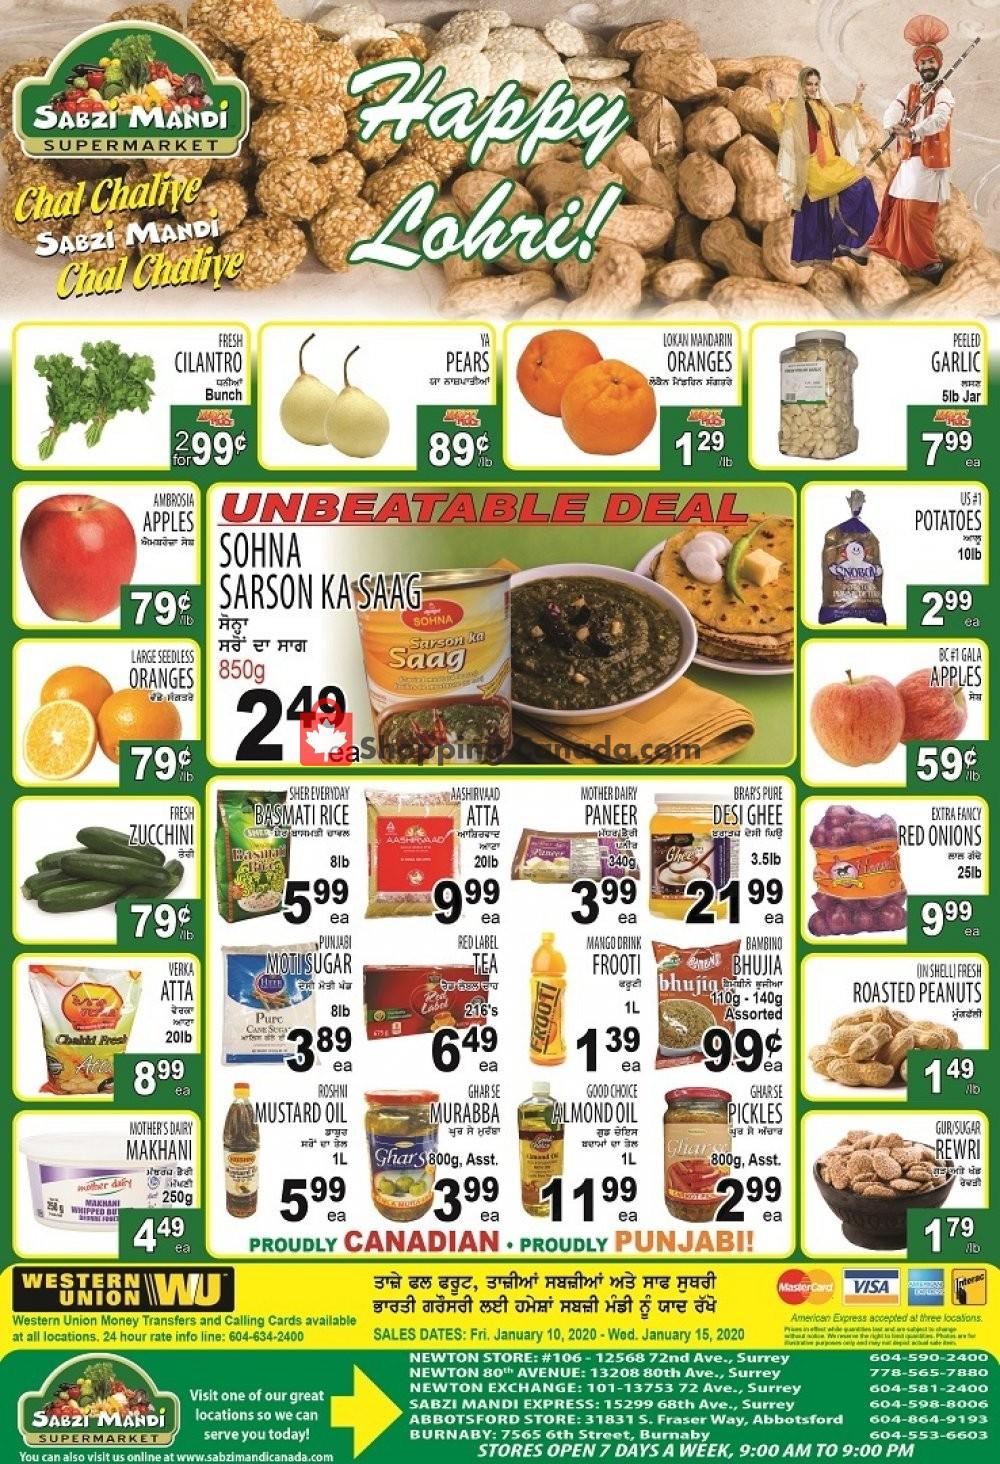 Flyer Sabzi Mandi Supermarket Canada - from Friday January 10, 2020 to Wednesday January 15, 2020